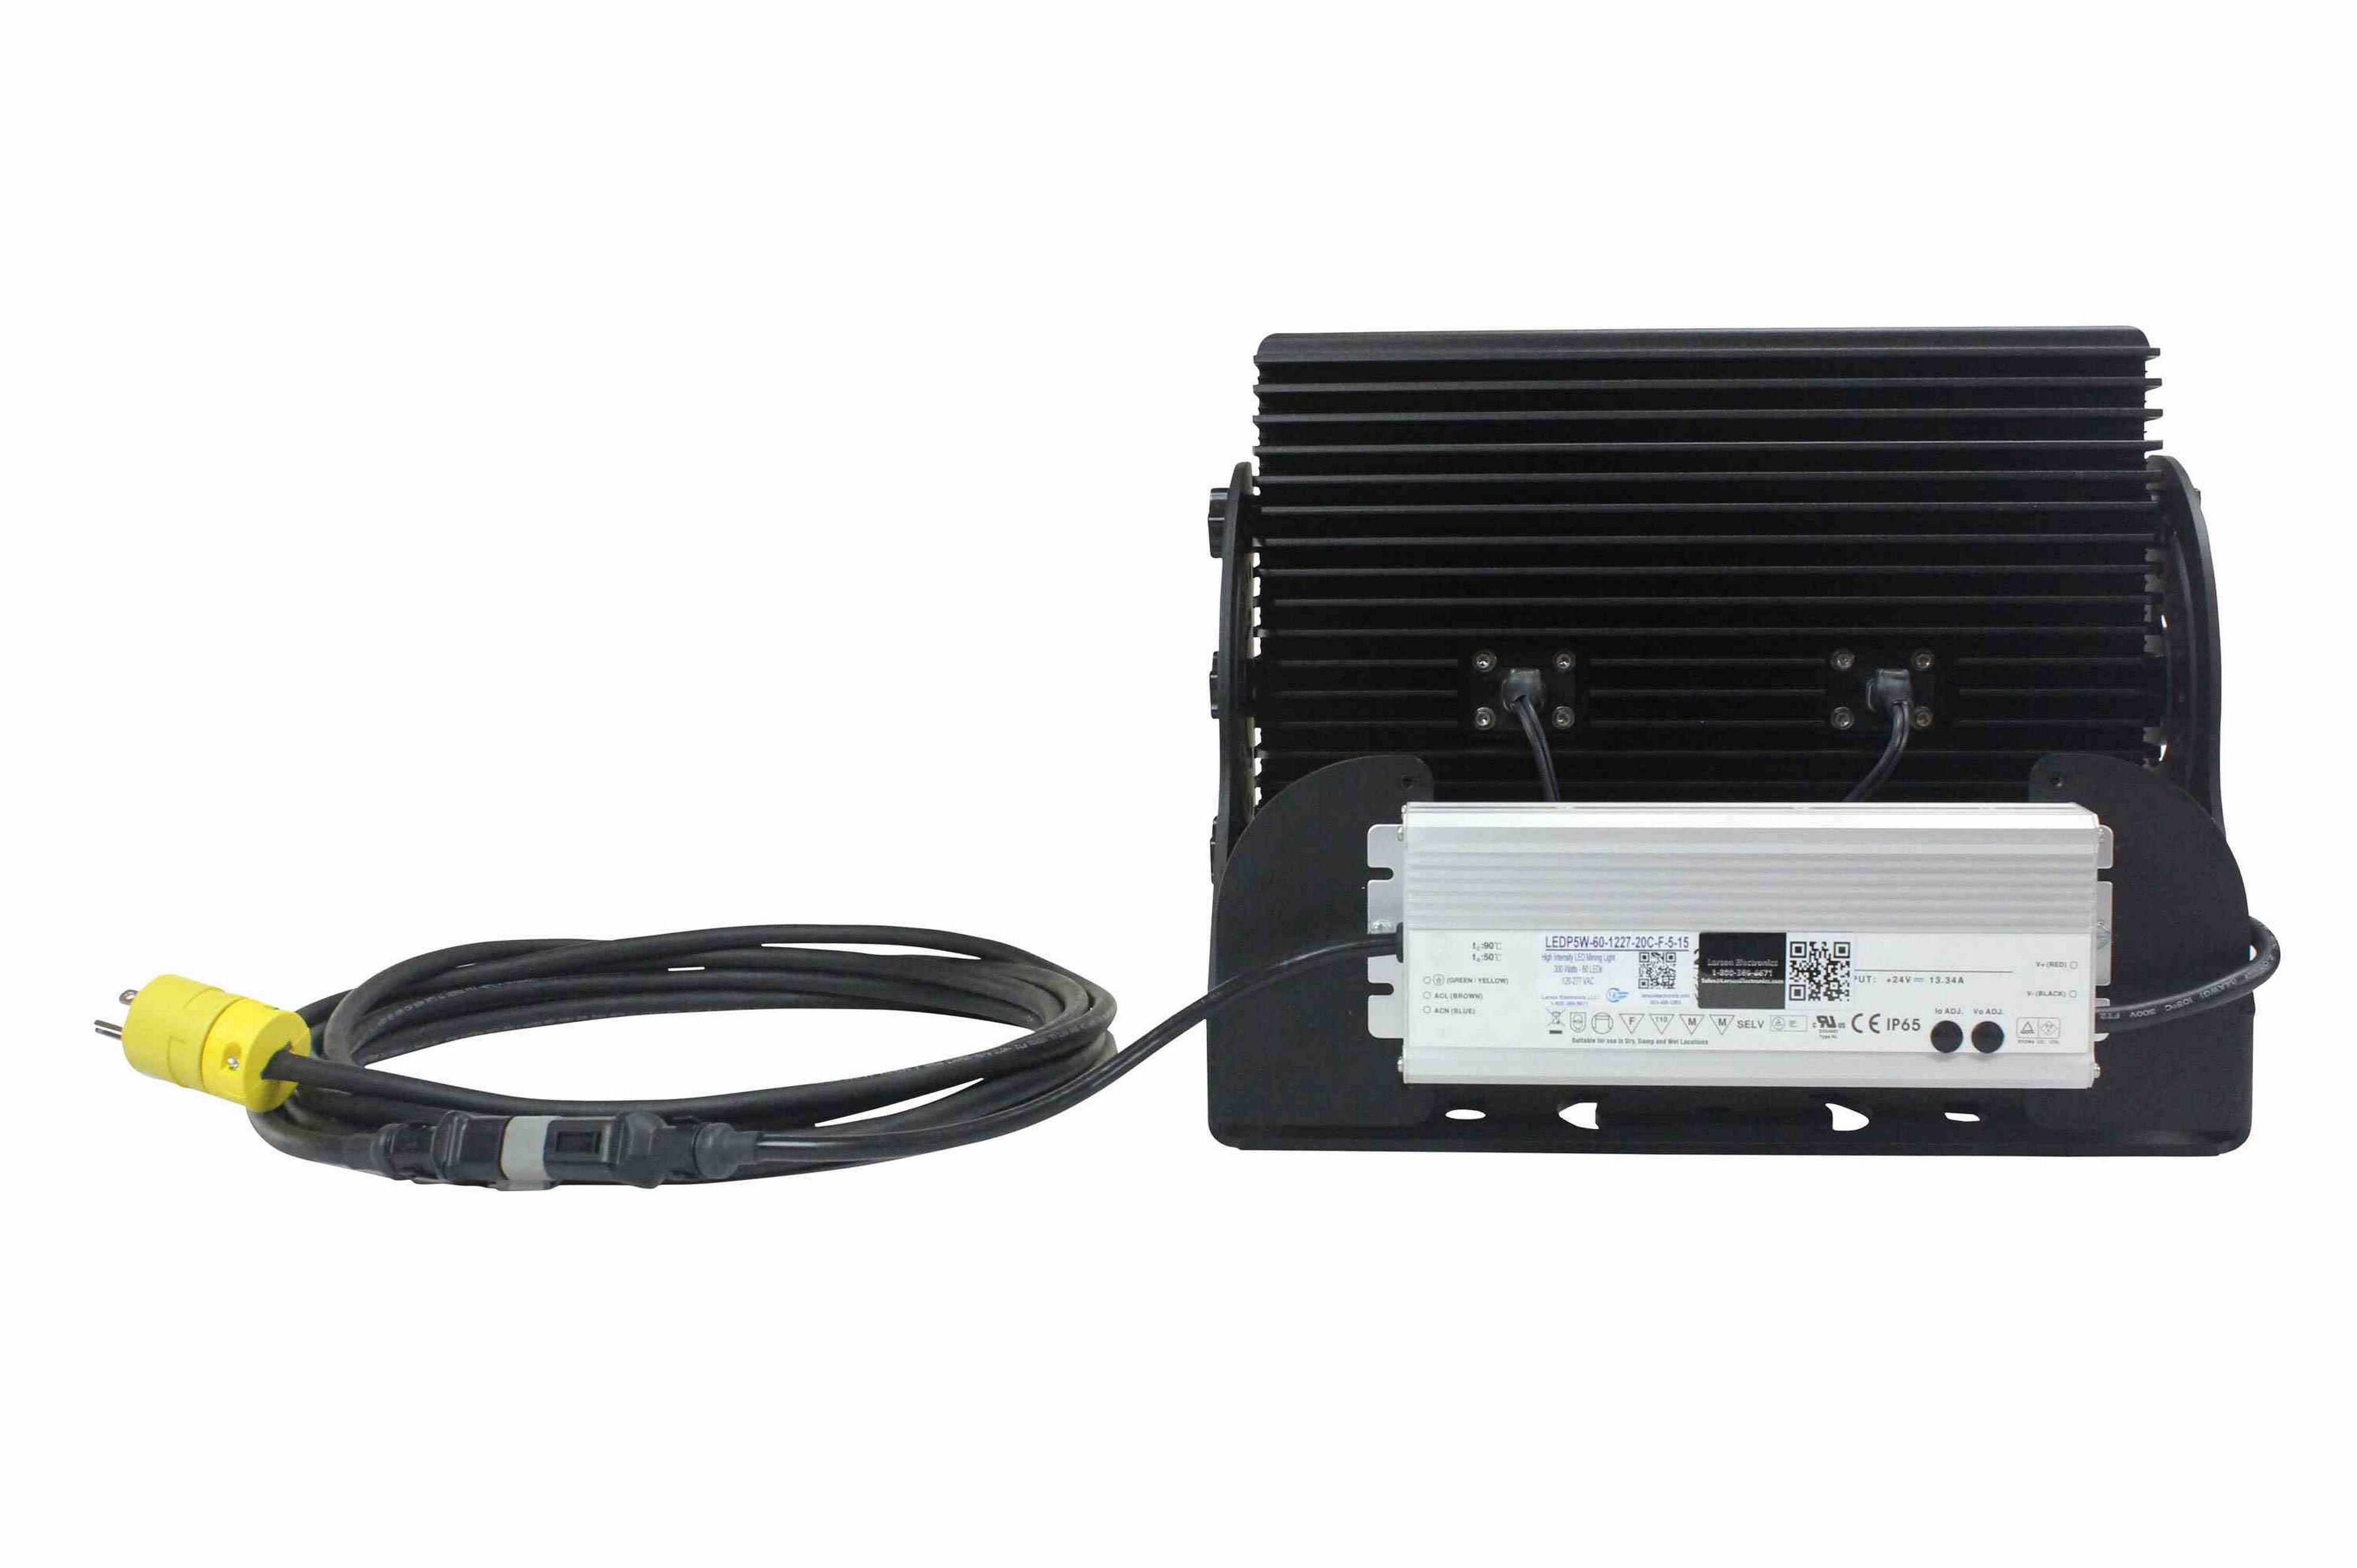 300 Watts High Intensity LED Light w/ 20 Cord and Wall Plug - 60 LEDs - 29,580 Lumens - 120 ...